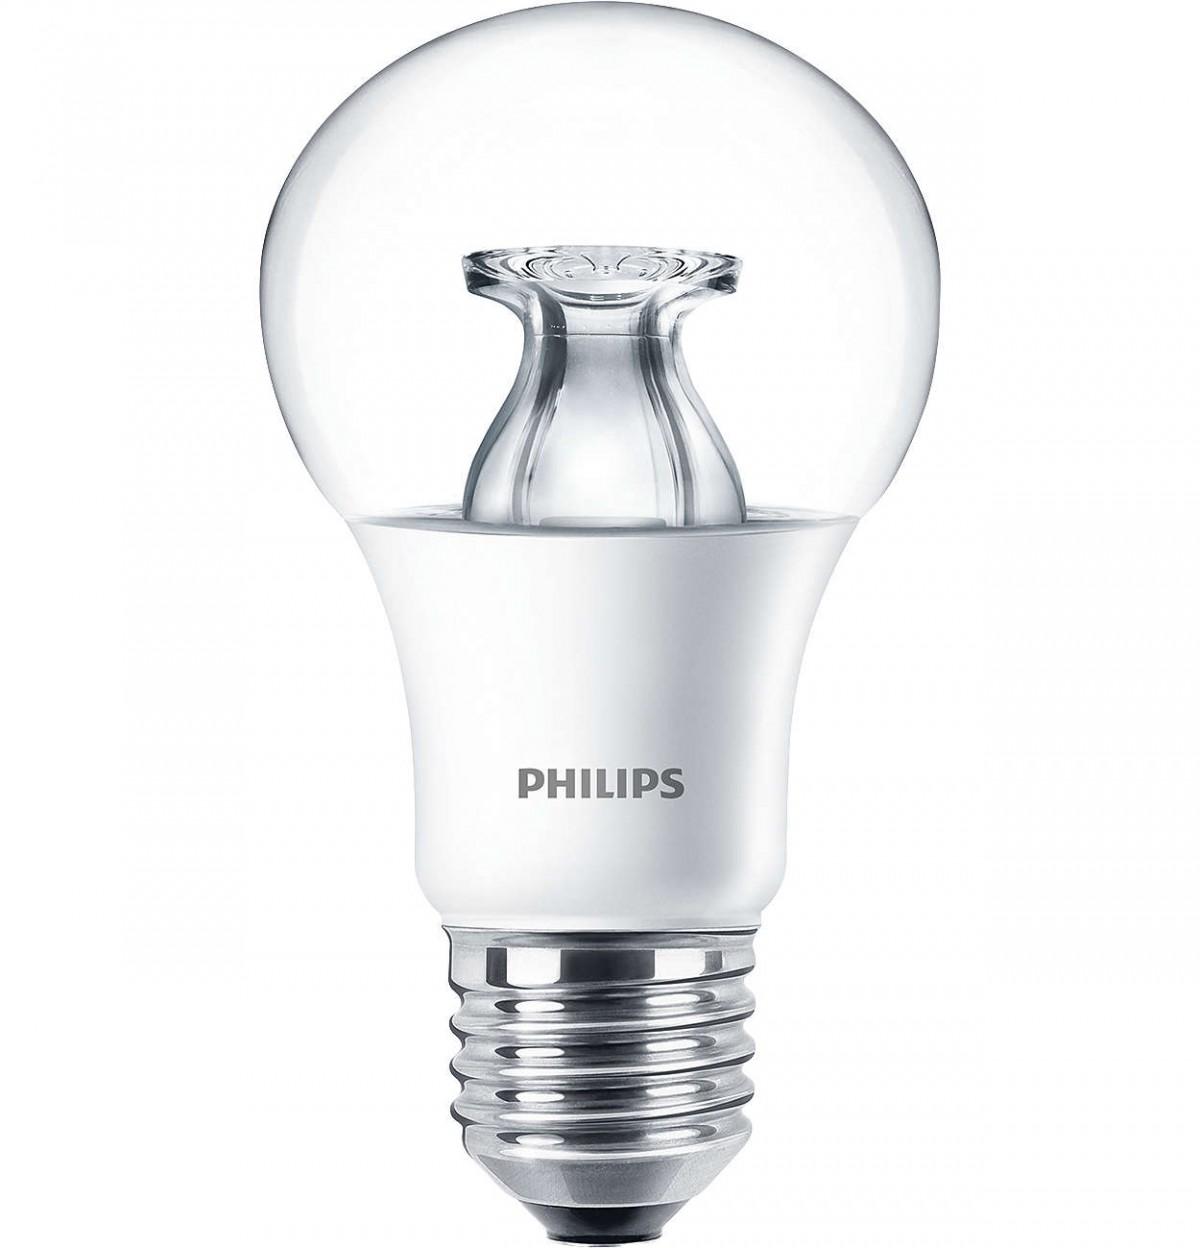 LED žárovka úsporná Philips 9W -> ekvivalent 60W E27 - MASTER LEDbulb DT 9-60W E27 A60 CL